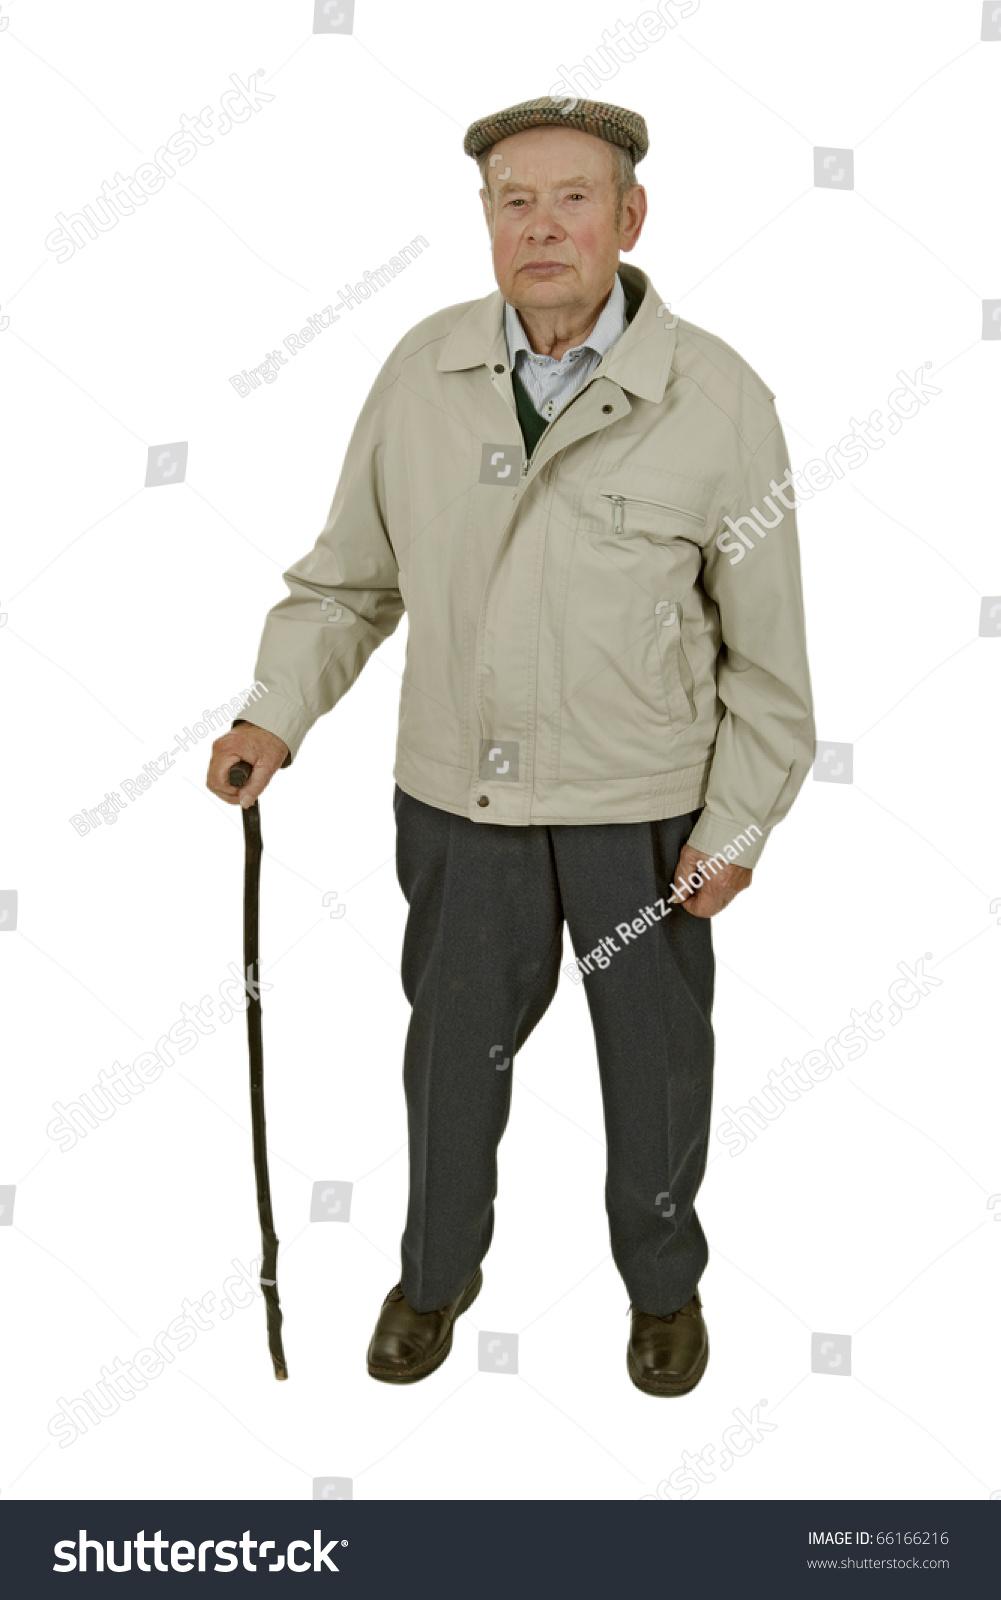 elderly man walking - photo #27